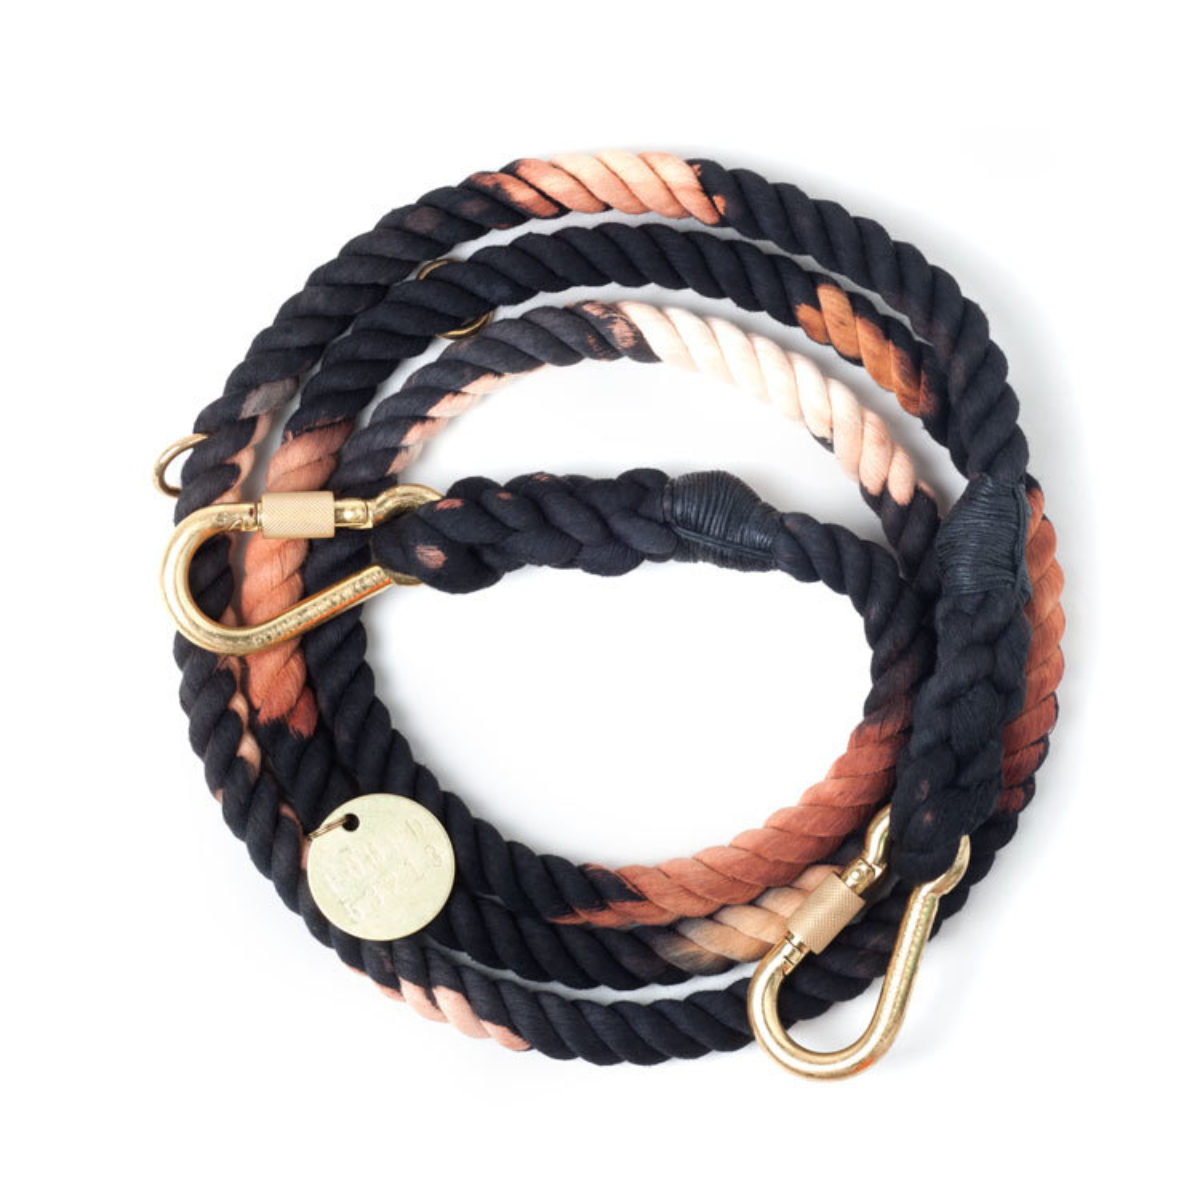 Galaxy rope dog leash, adjustable